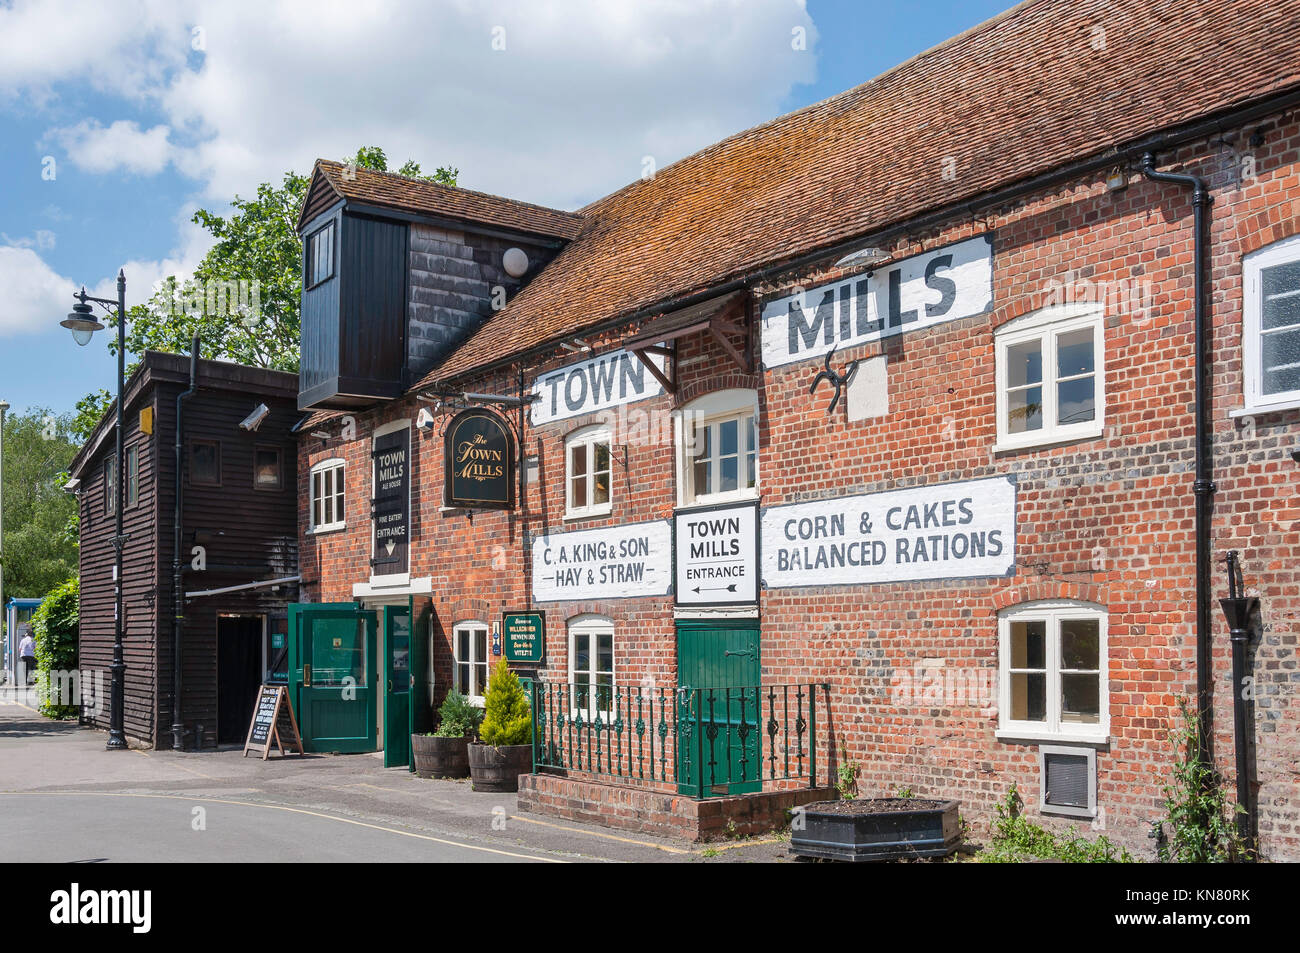 The Town Mills Ale House, Bridge Street, Andover, Hampshire, England, United Kingdom Stock Photo